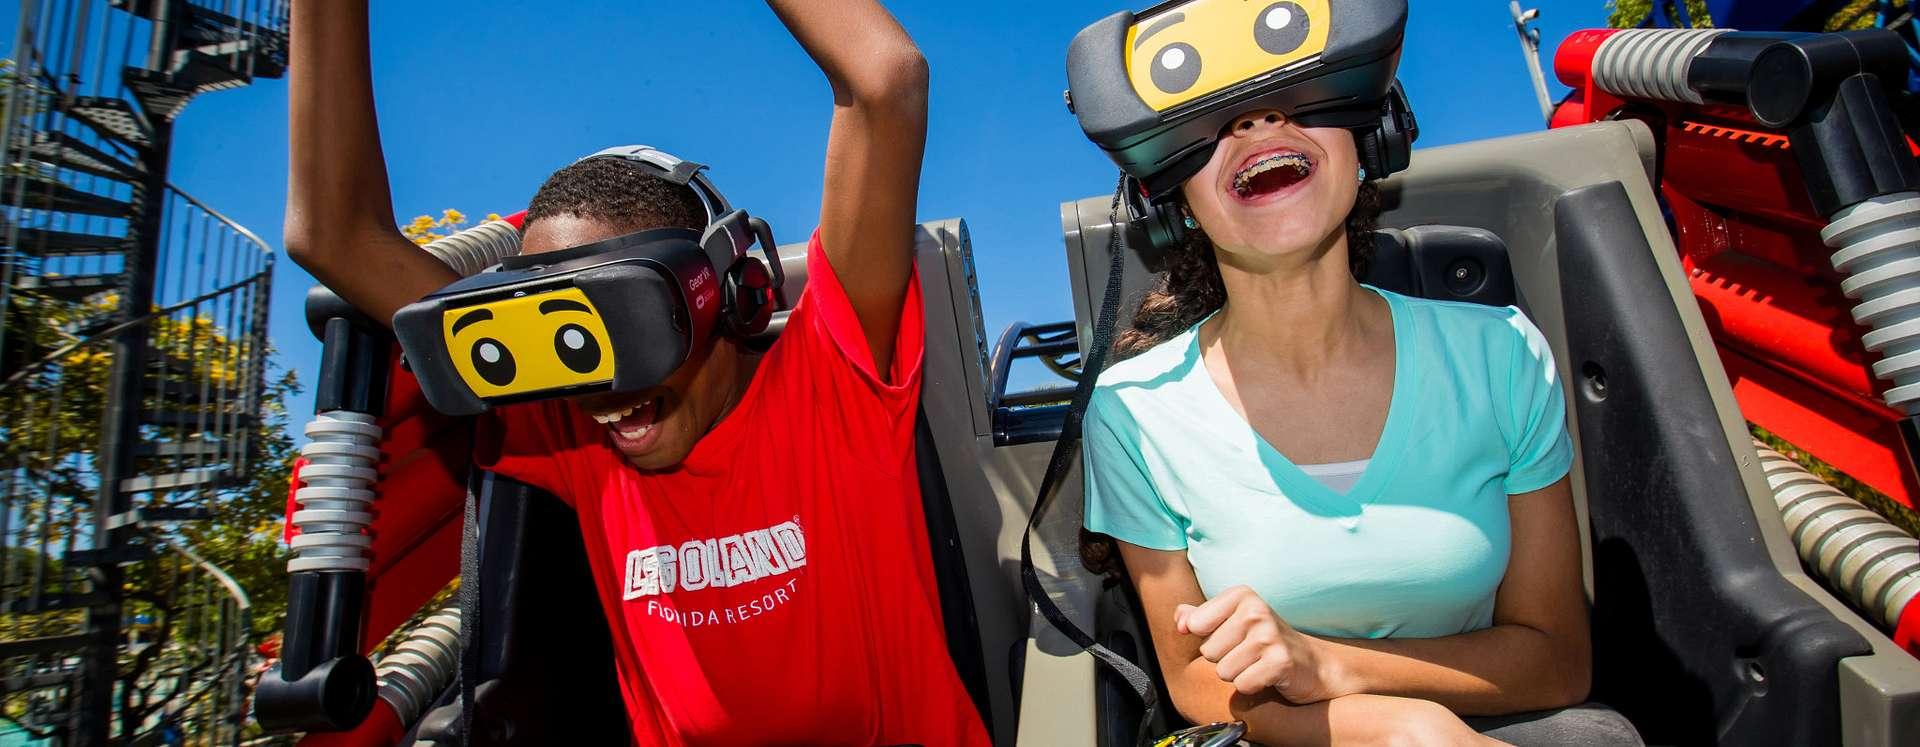 A boy and a girl at LEGOLAND® Florida Resort enjoying The Great LEGO Race